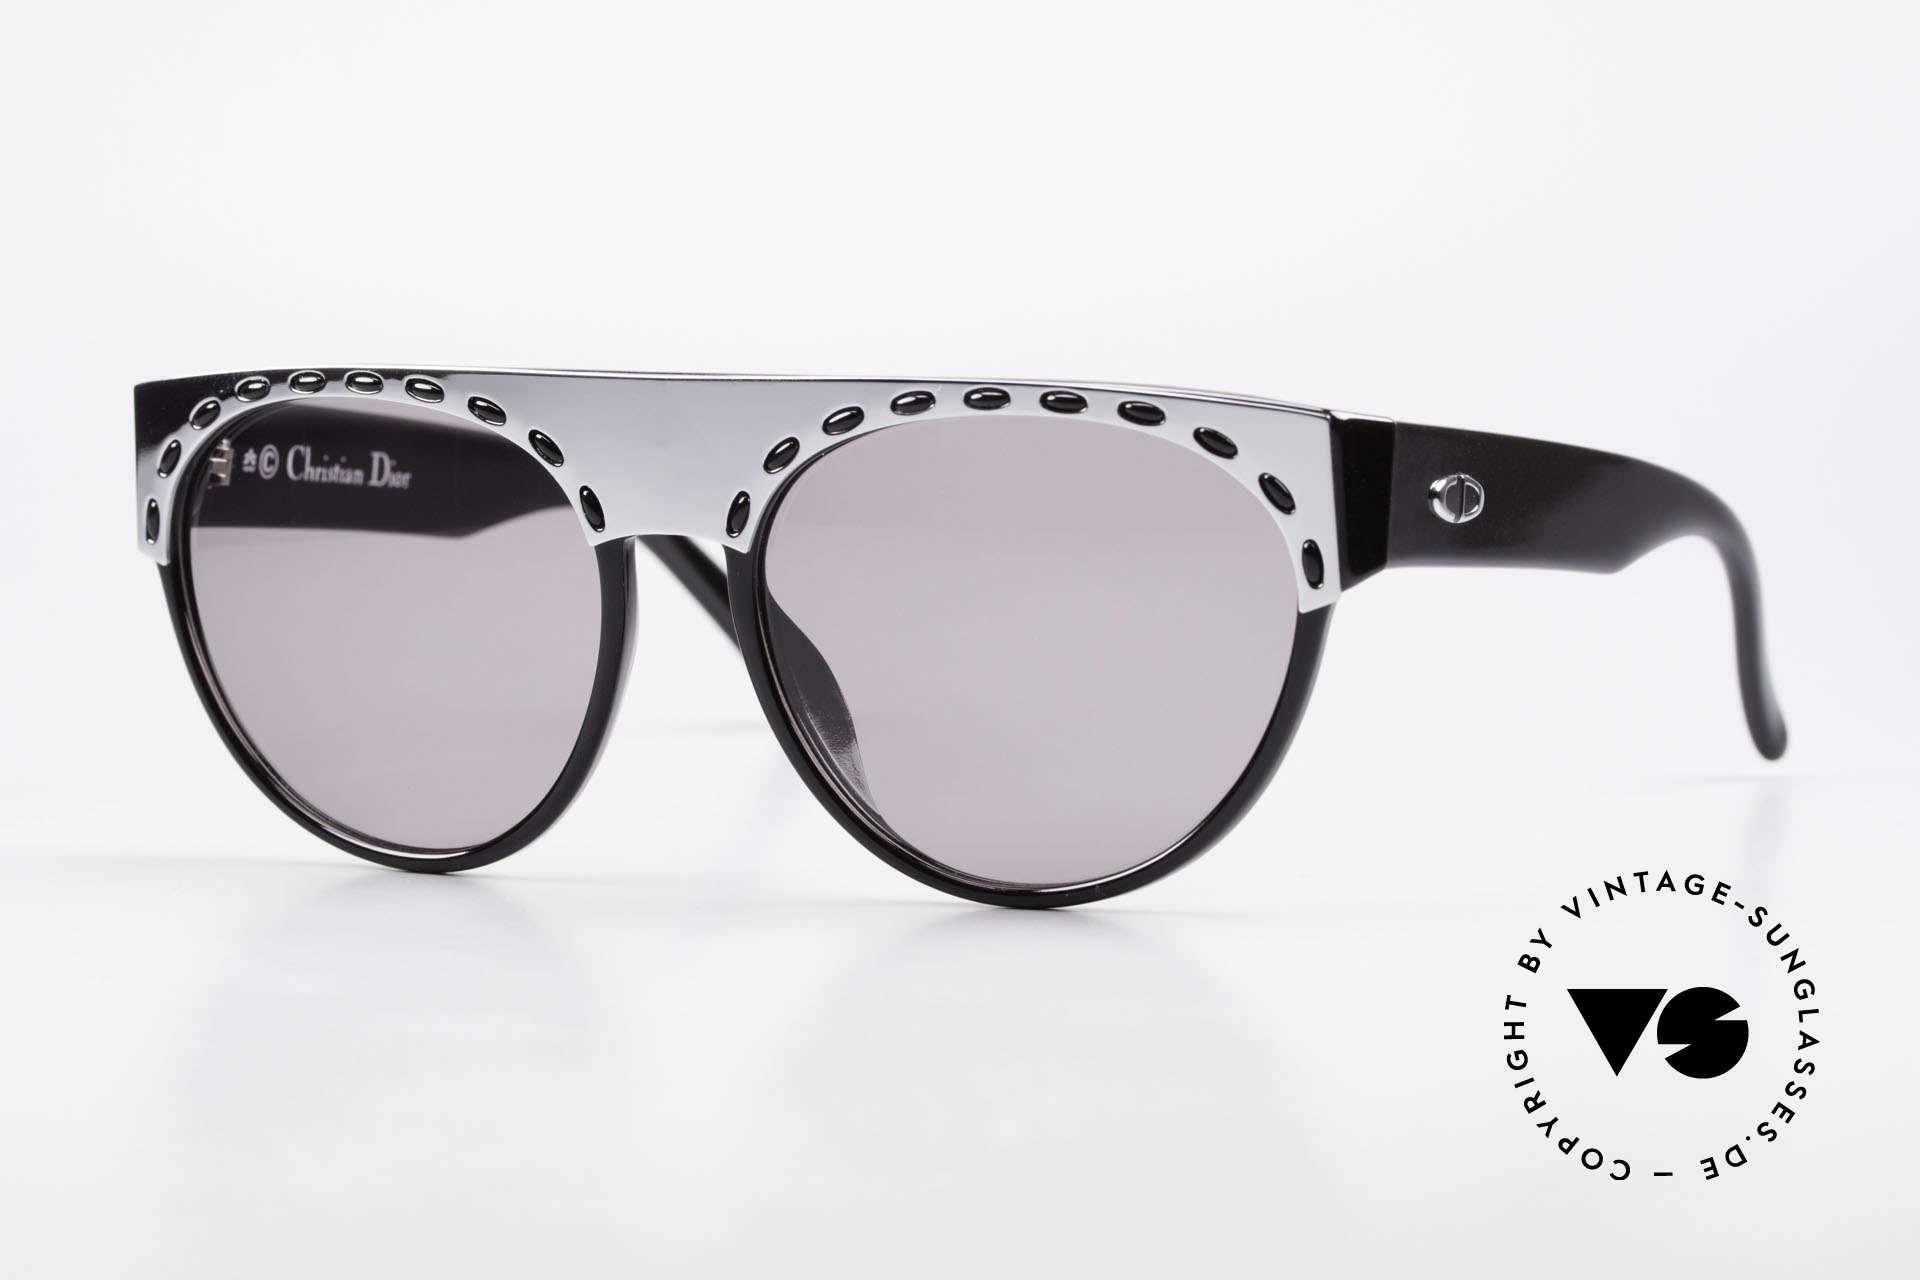 Christian Dior 2437 Ladies 80's Sunglasses Vintage, superb sunglasses by Christian Dior from the late 80's, Made for Women